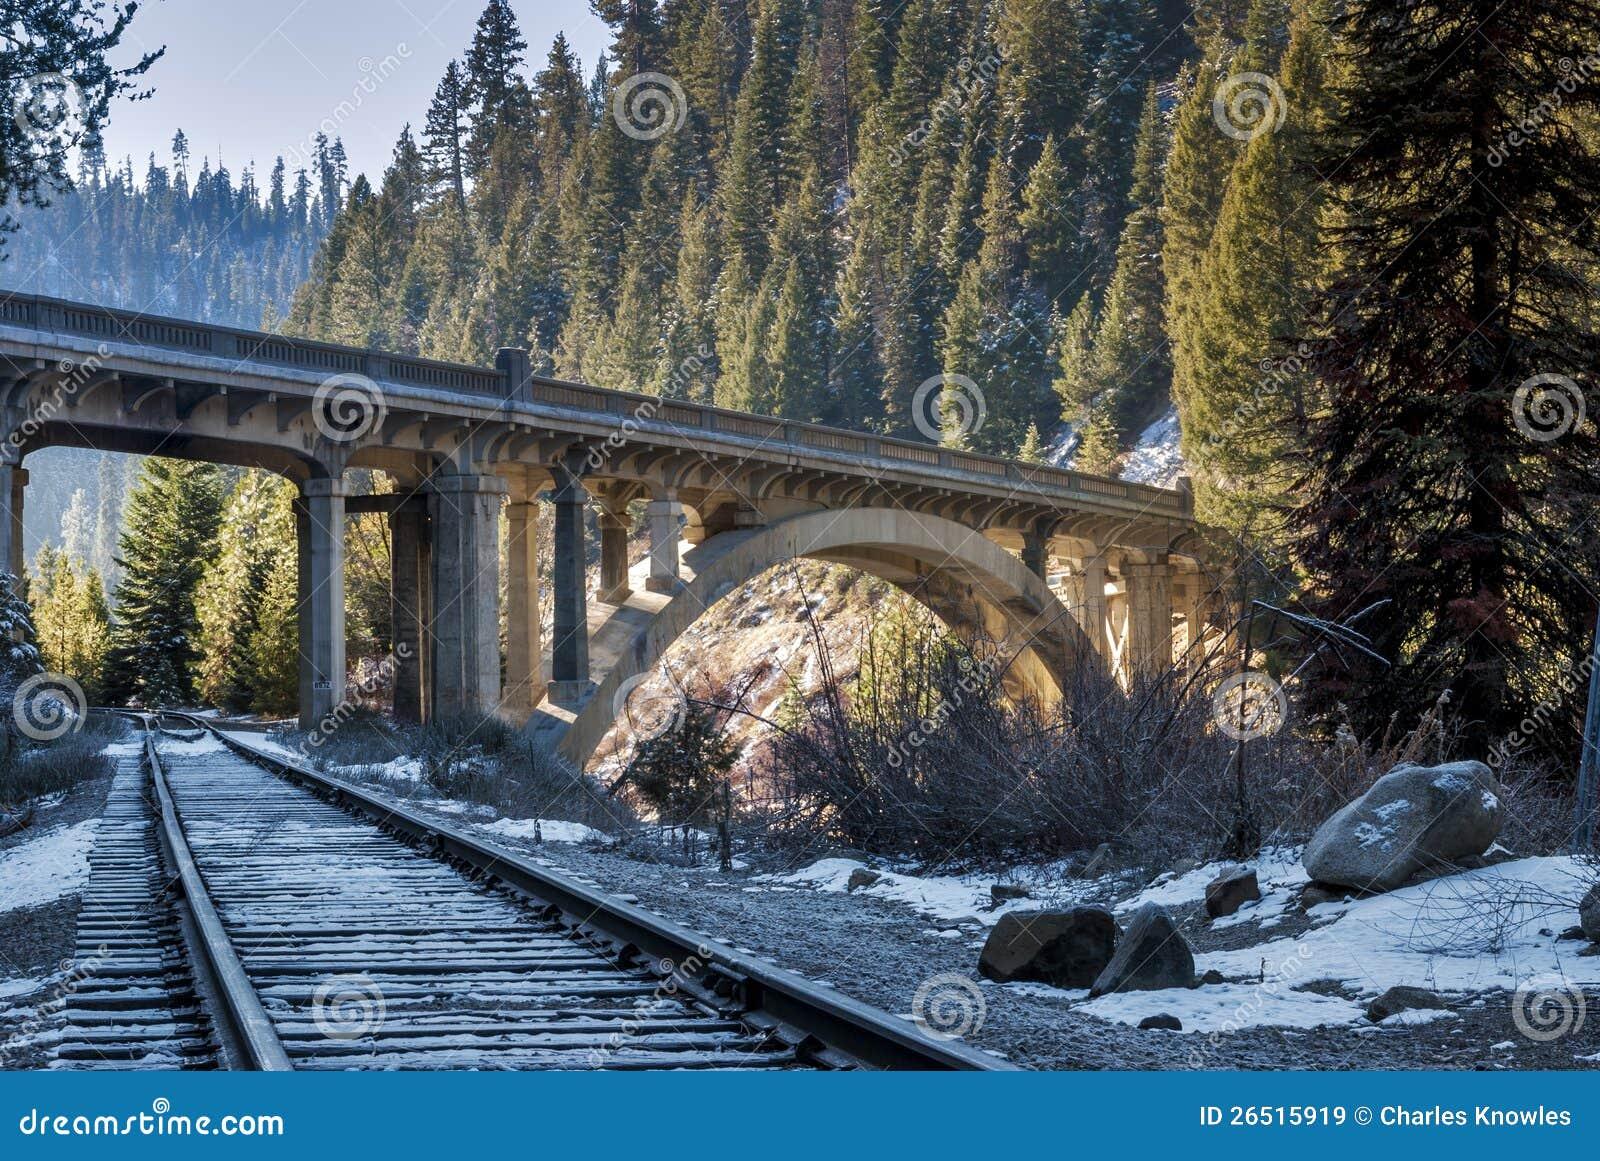 Cross the railroad tracks - 1 part 9